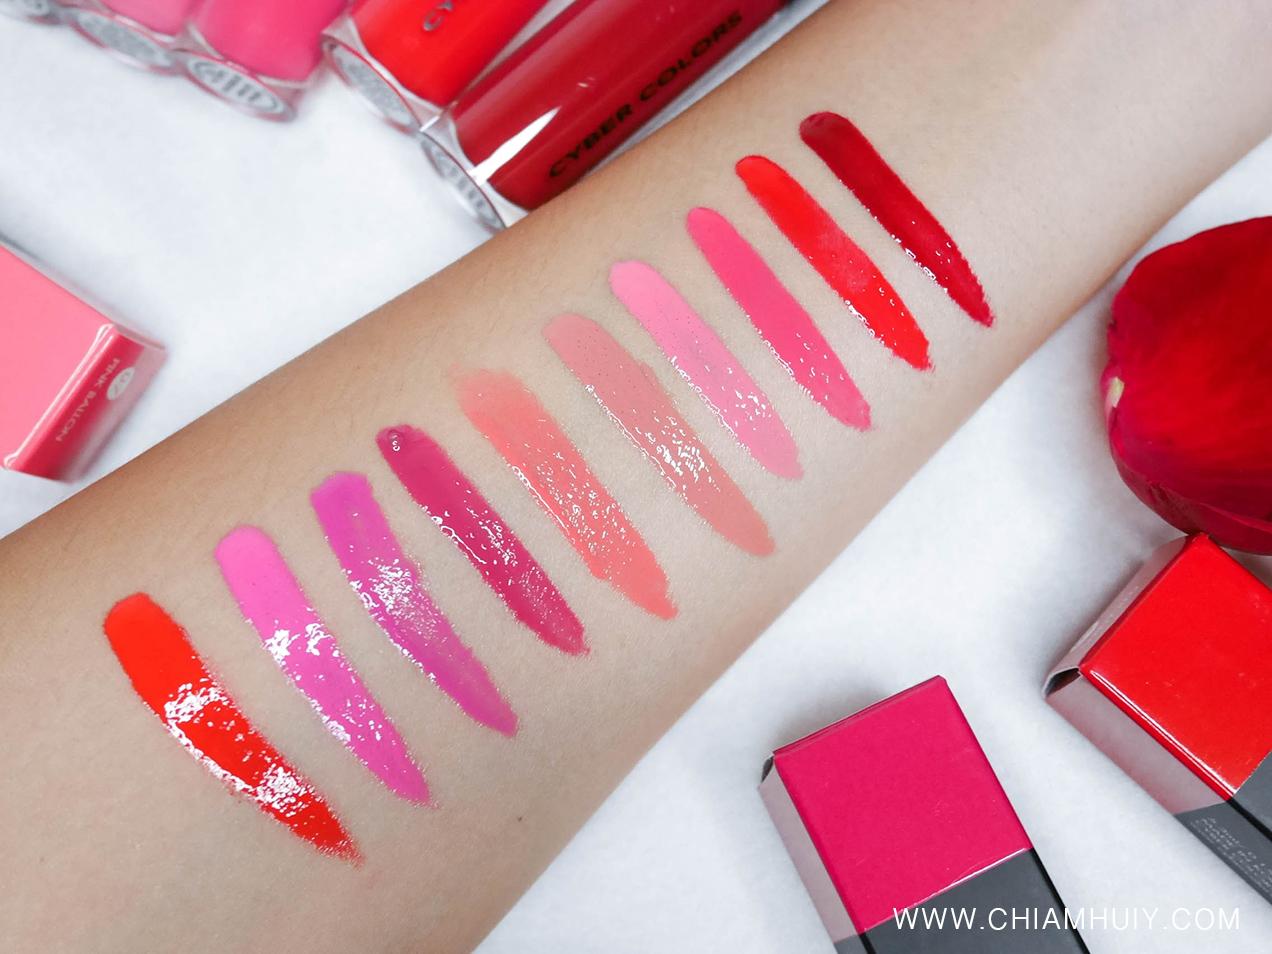 cyber colors anti lines lip lacquer review celine chiam